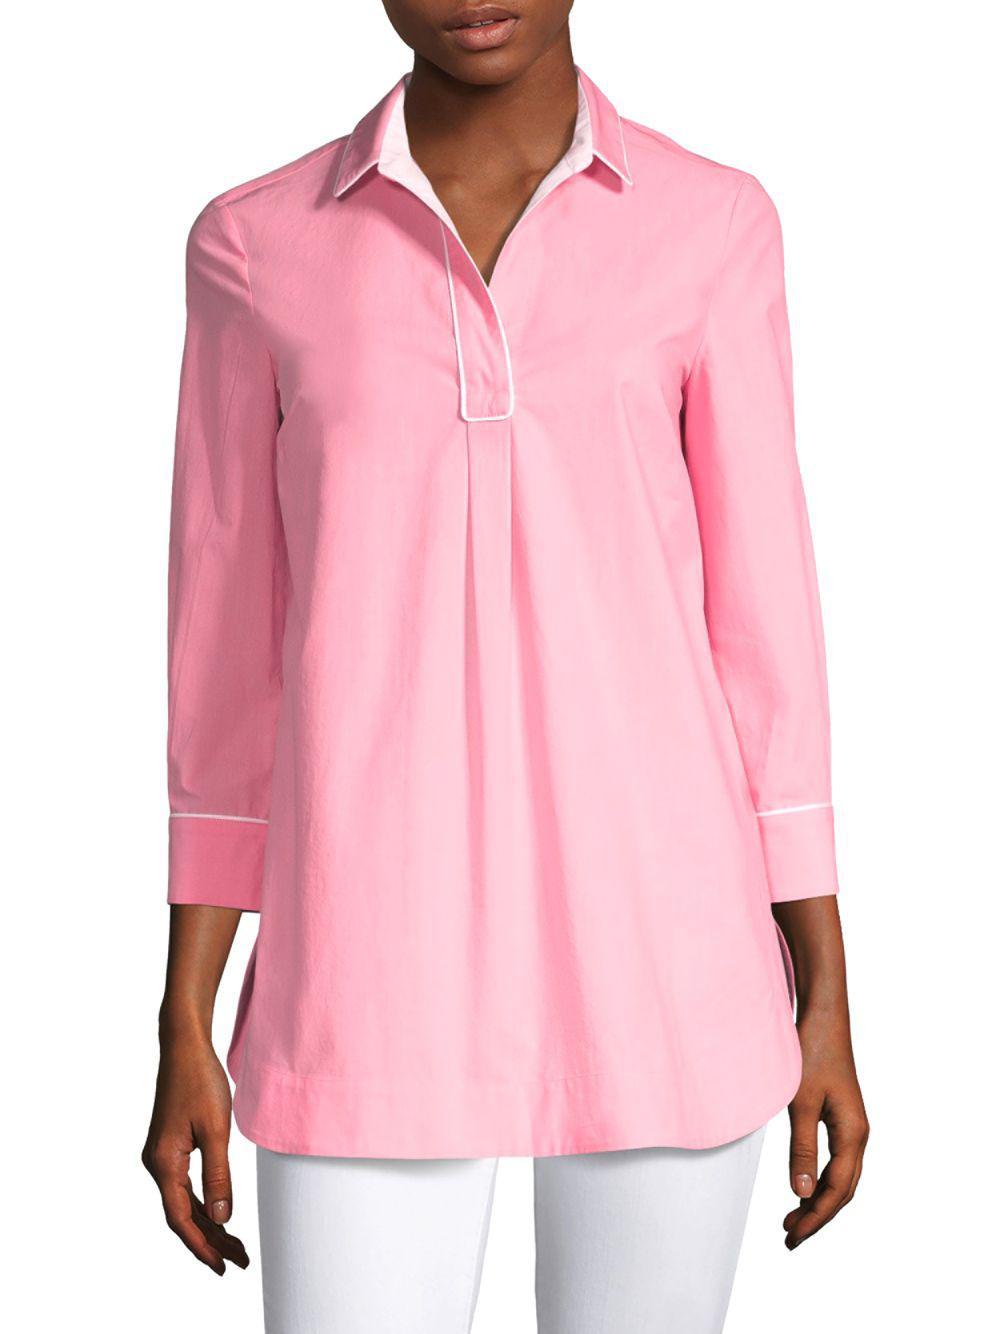 6910e2f6708 Piazza Sempione Eugenia Piping Tunic in Pink - Lyst